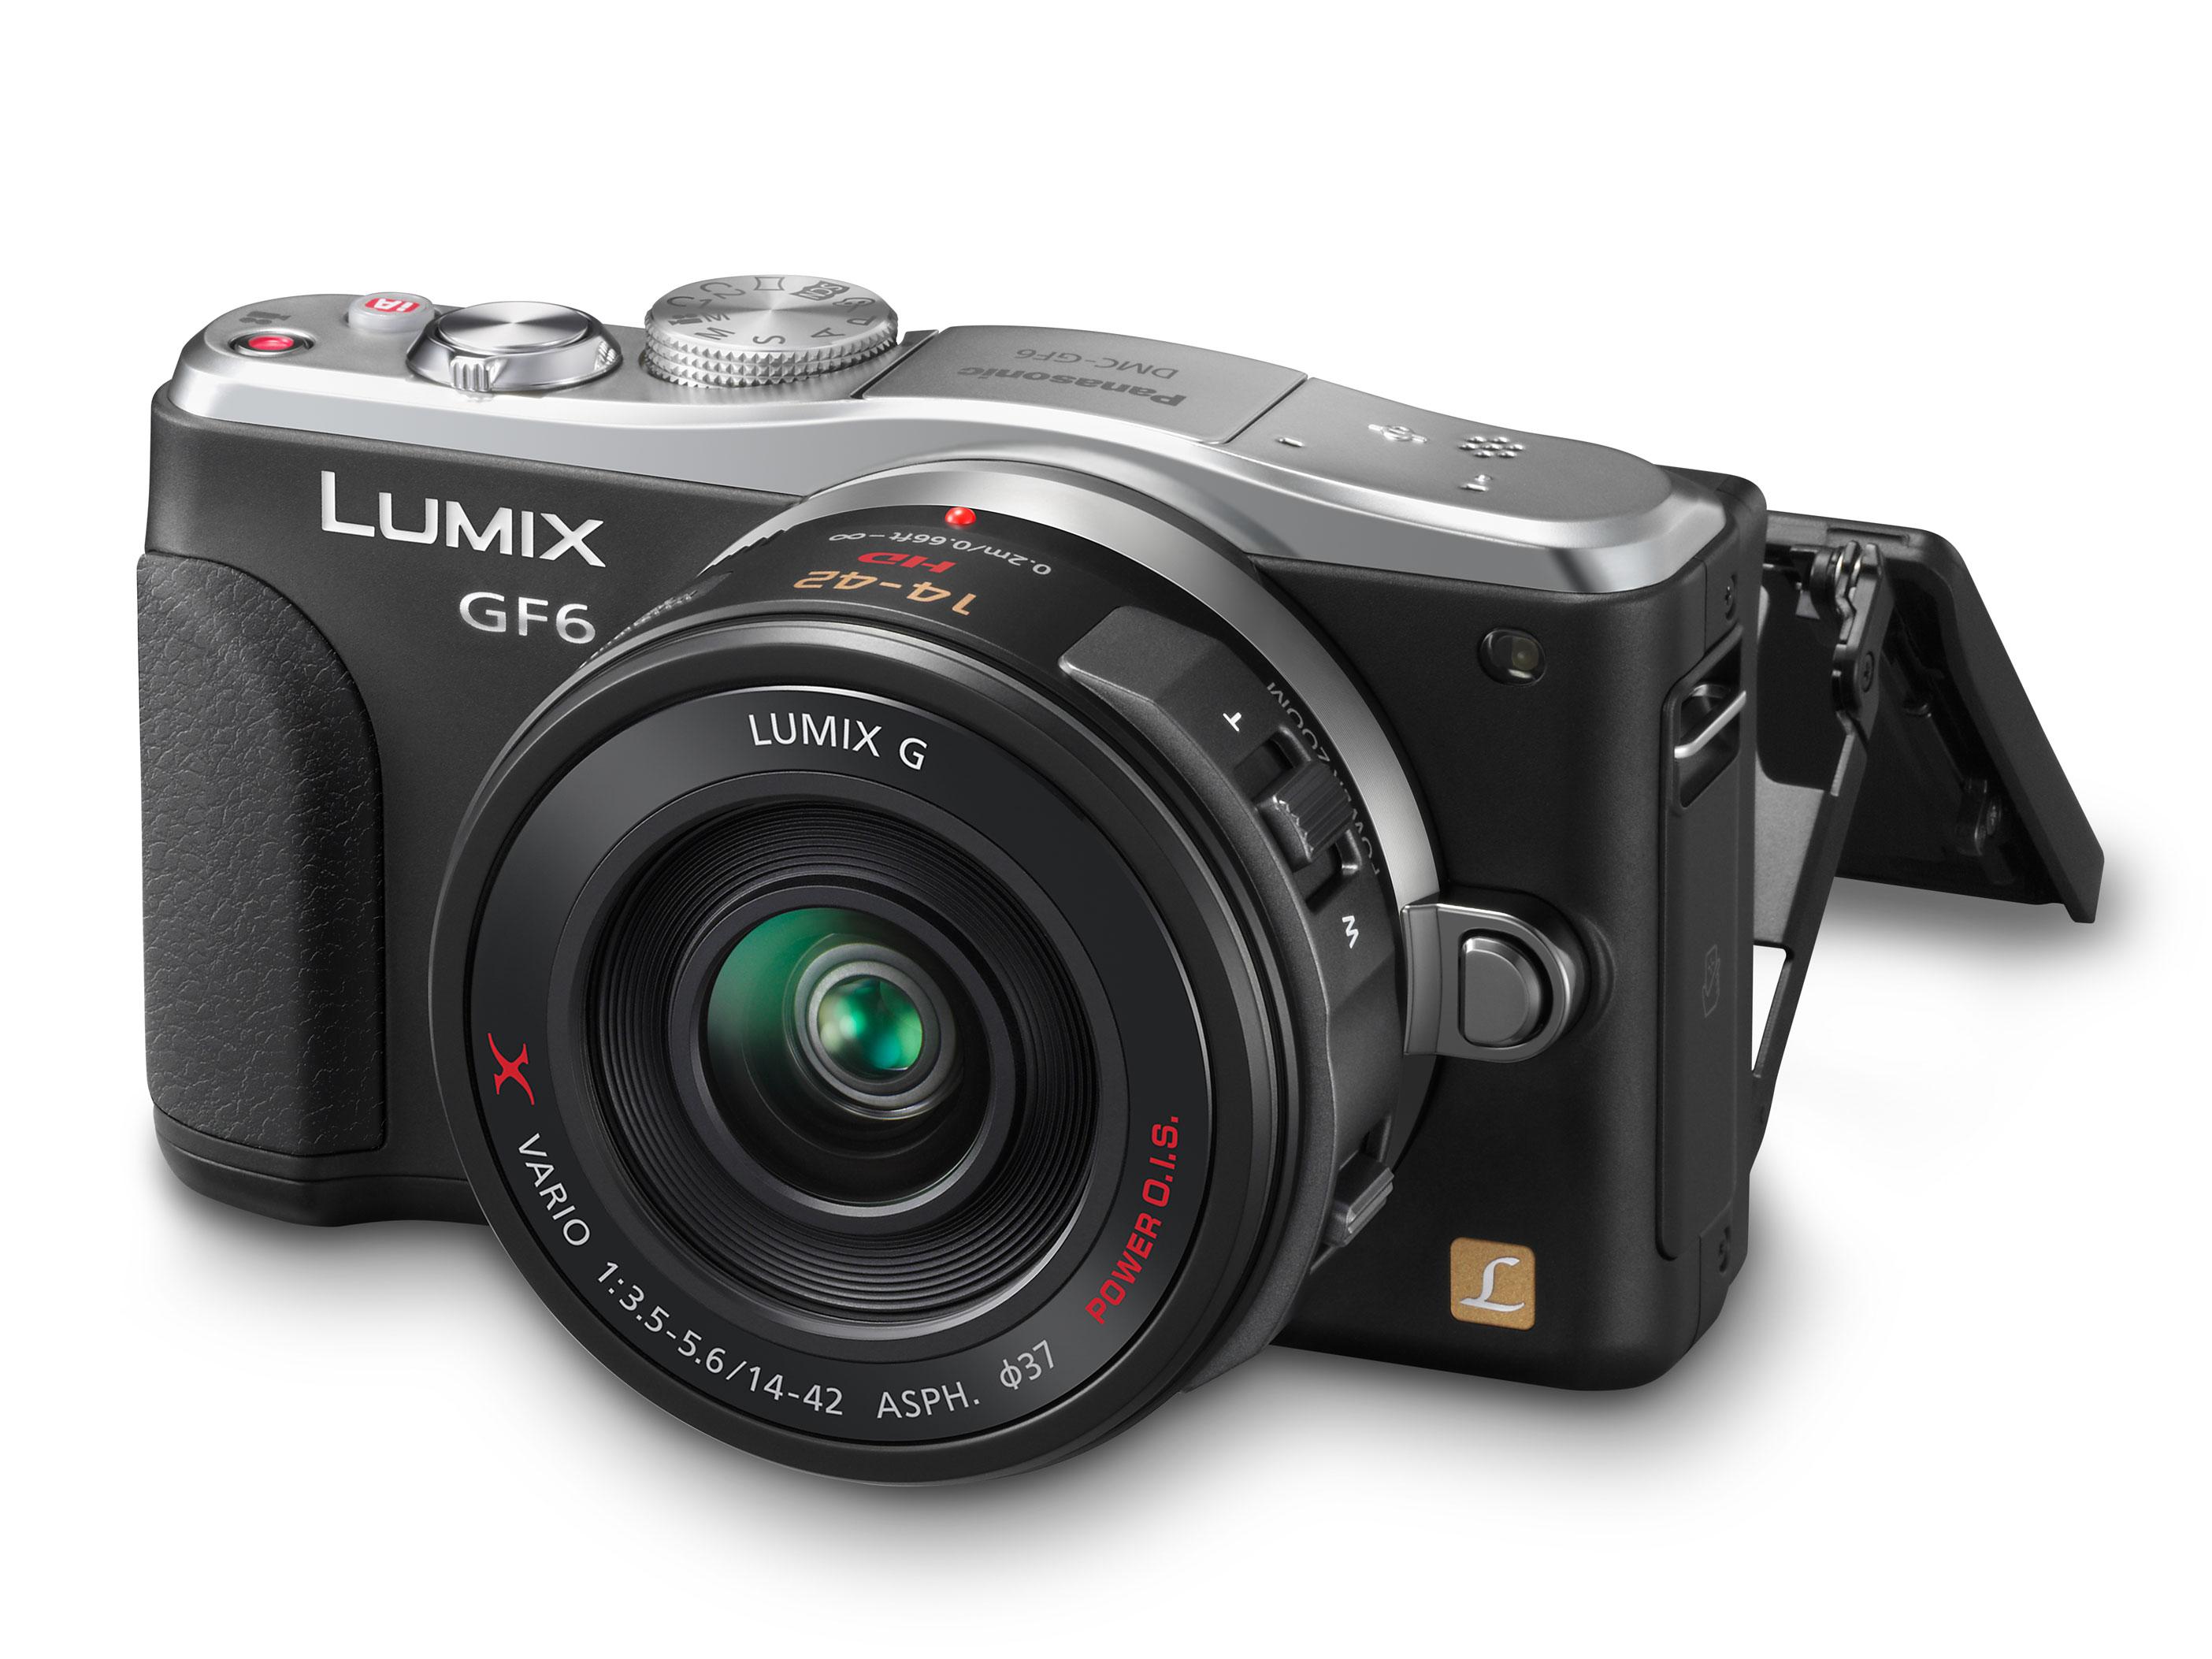 Panasonic Lumix DMC-GF6 Price, Specs, Release Date, Where